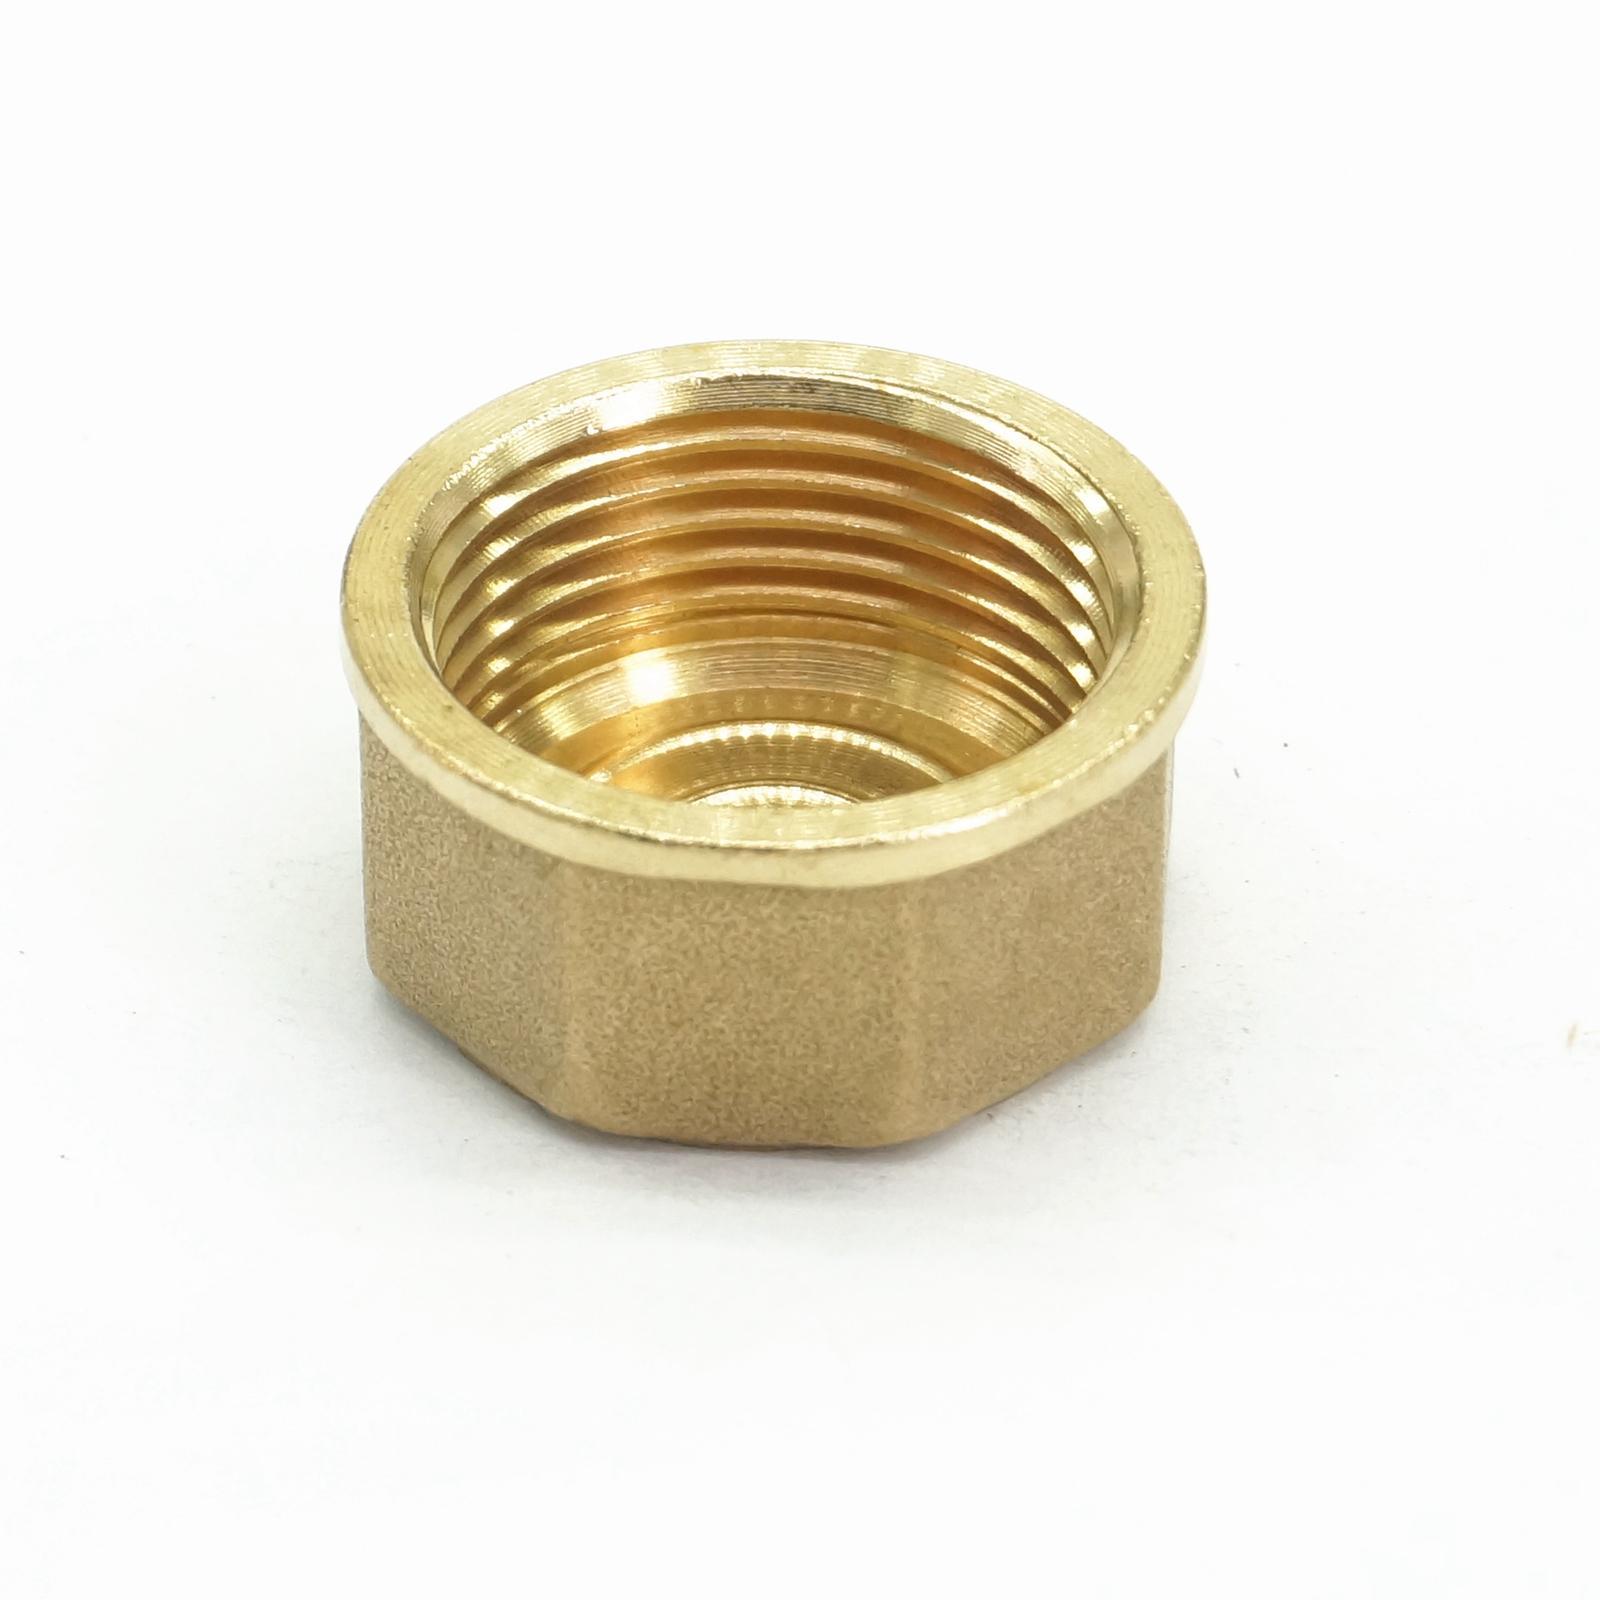 3/4 bspp Innengewinde Messing Rohr Versenkt Stecker Hex Kopf Sockel Rohr Armaturen End Kappe Hohe Belastbarkeit Rohrverbindungsstücke